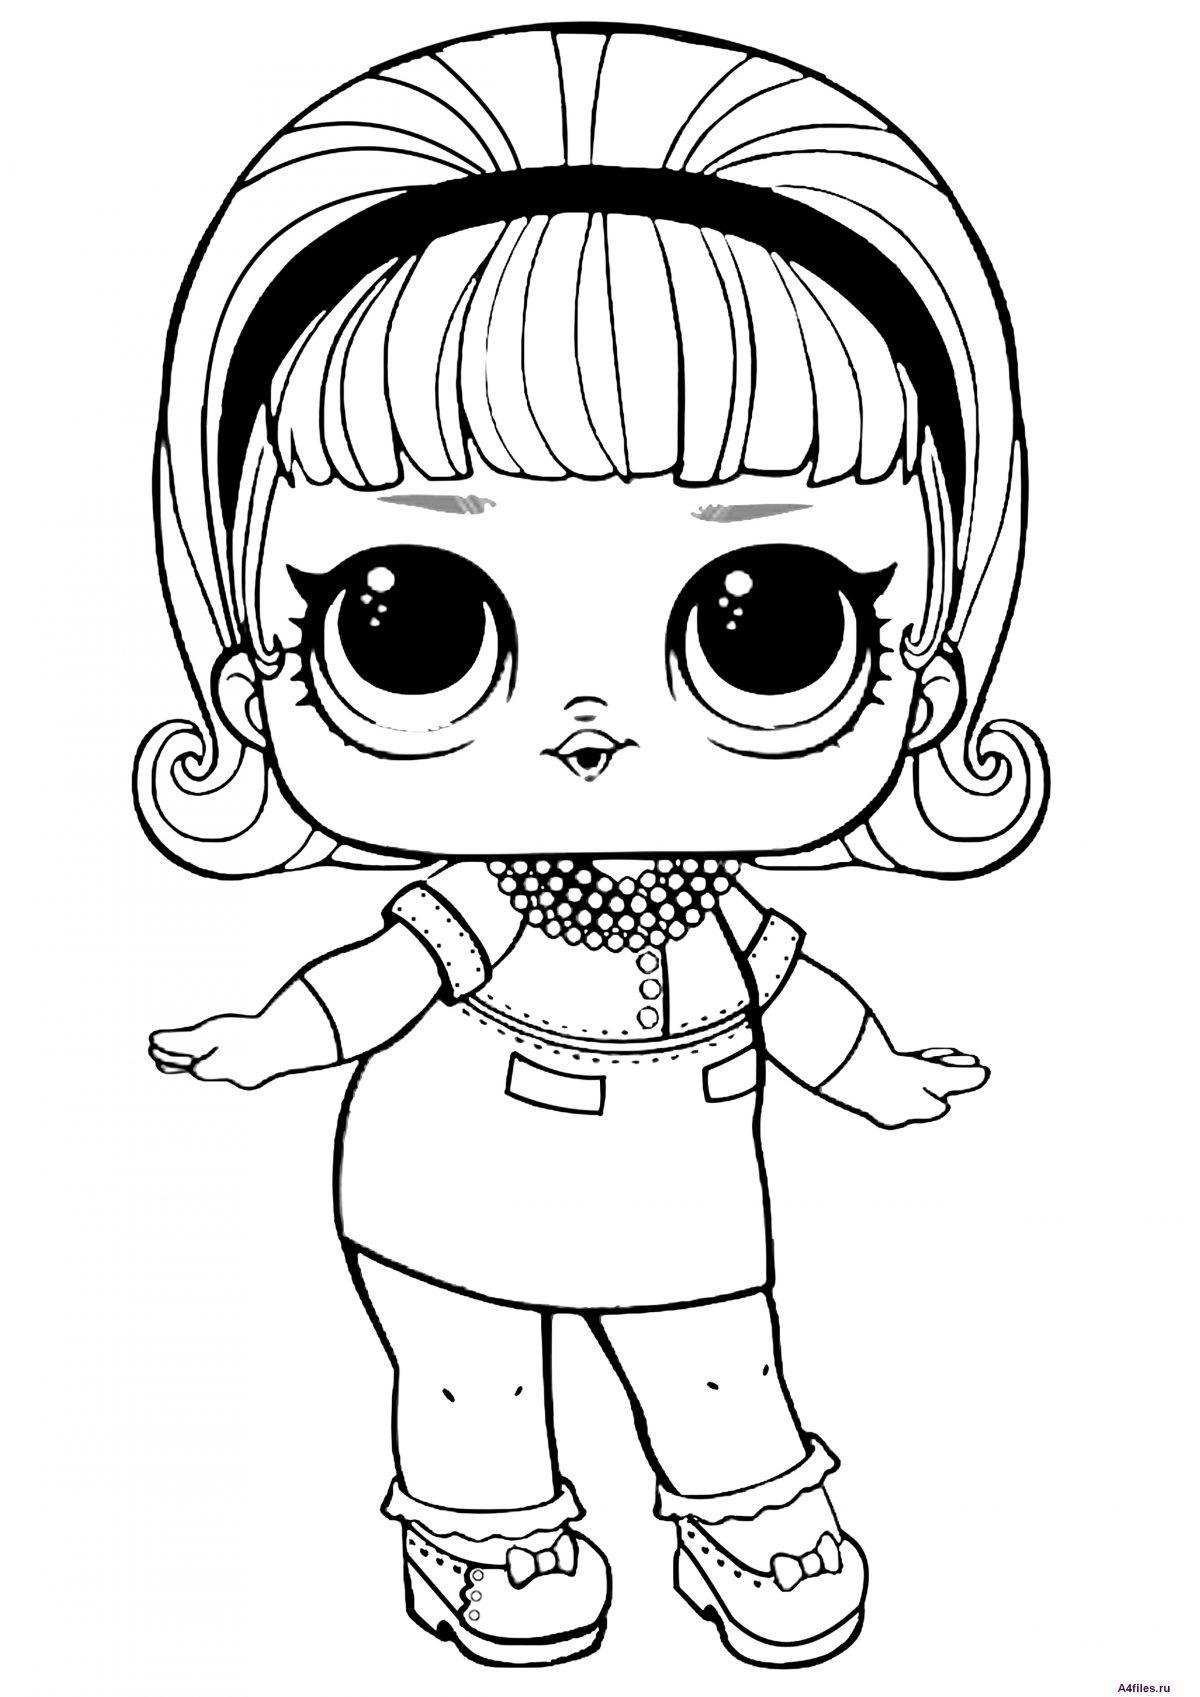 Раскраски Куклы Лол Распечатать Формат А4